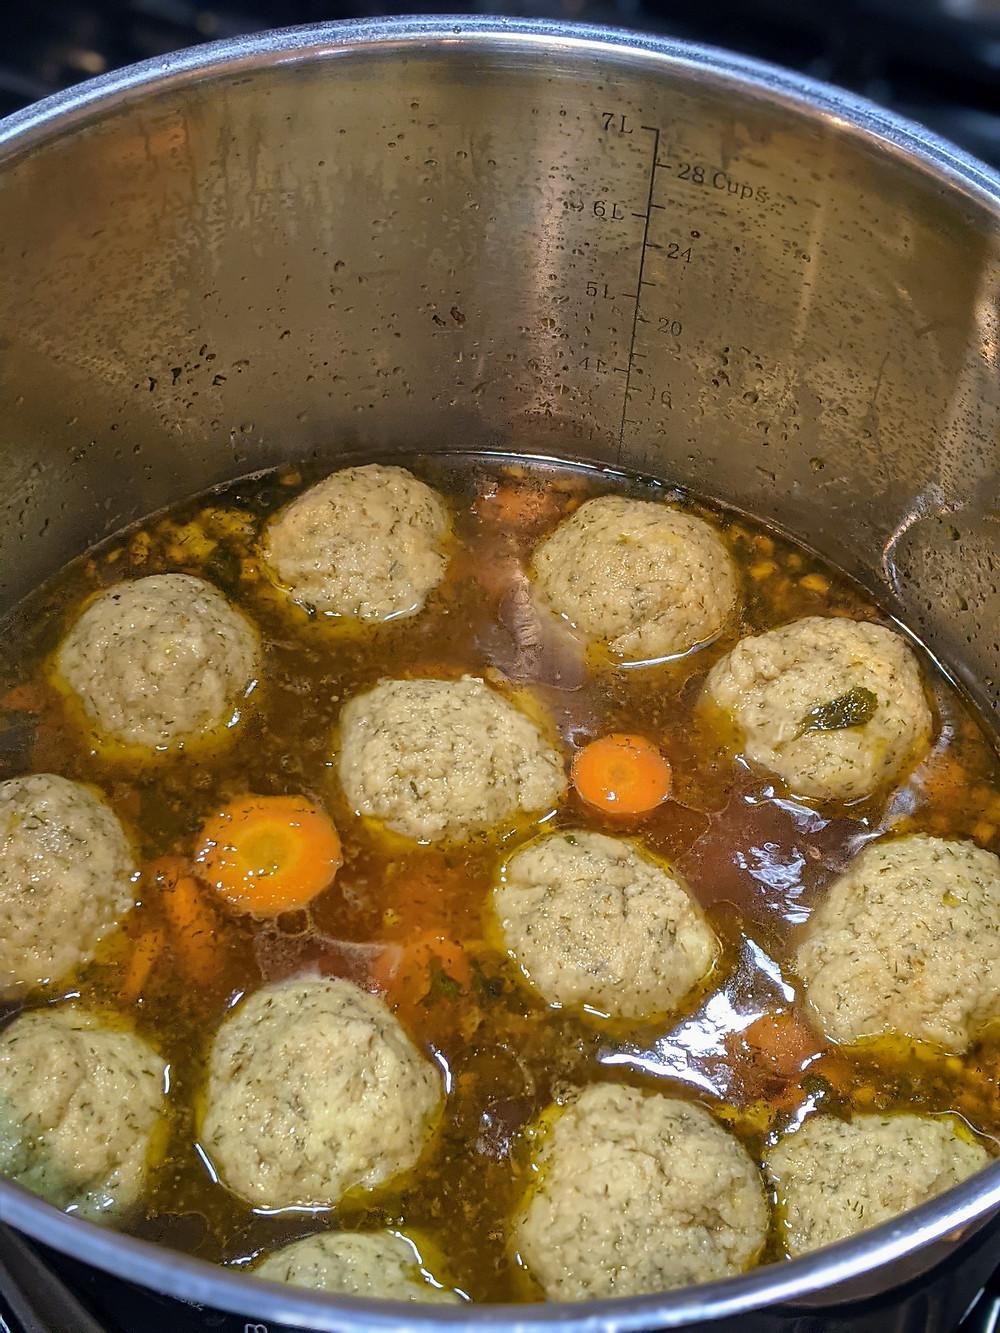 Homemade Gluten-Free Matzo Ball Soup - amanda macgregor centineo - food allergy recipes